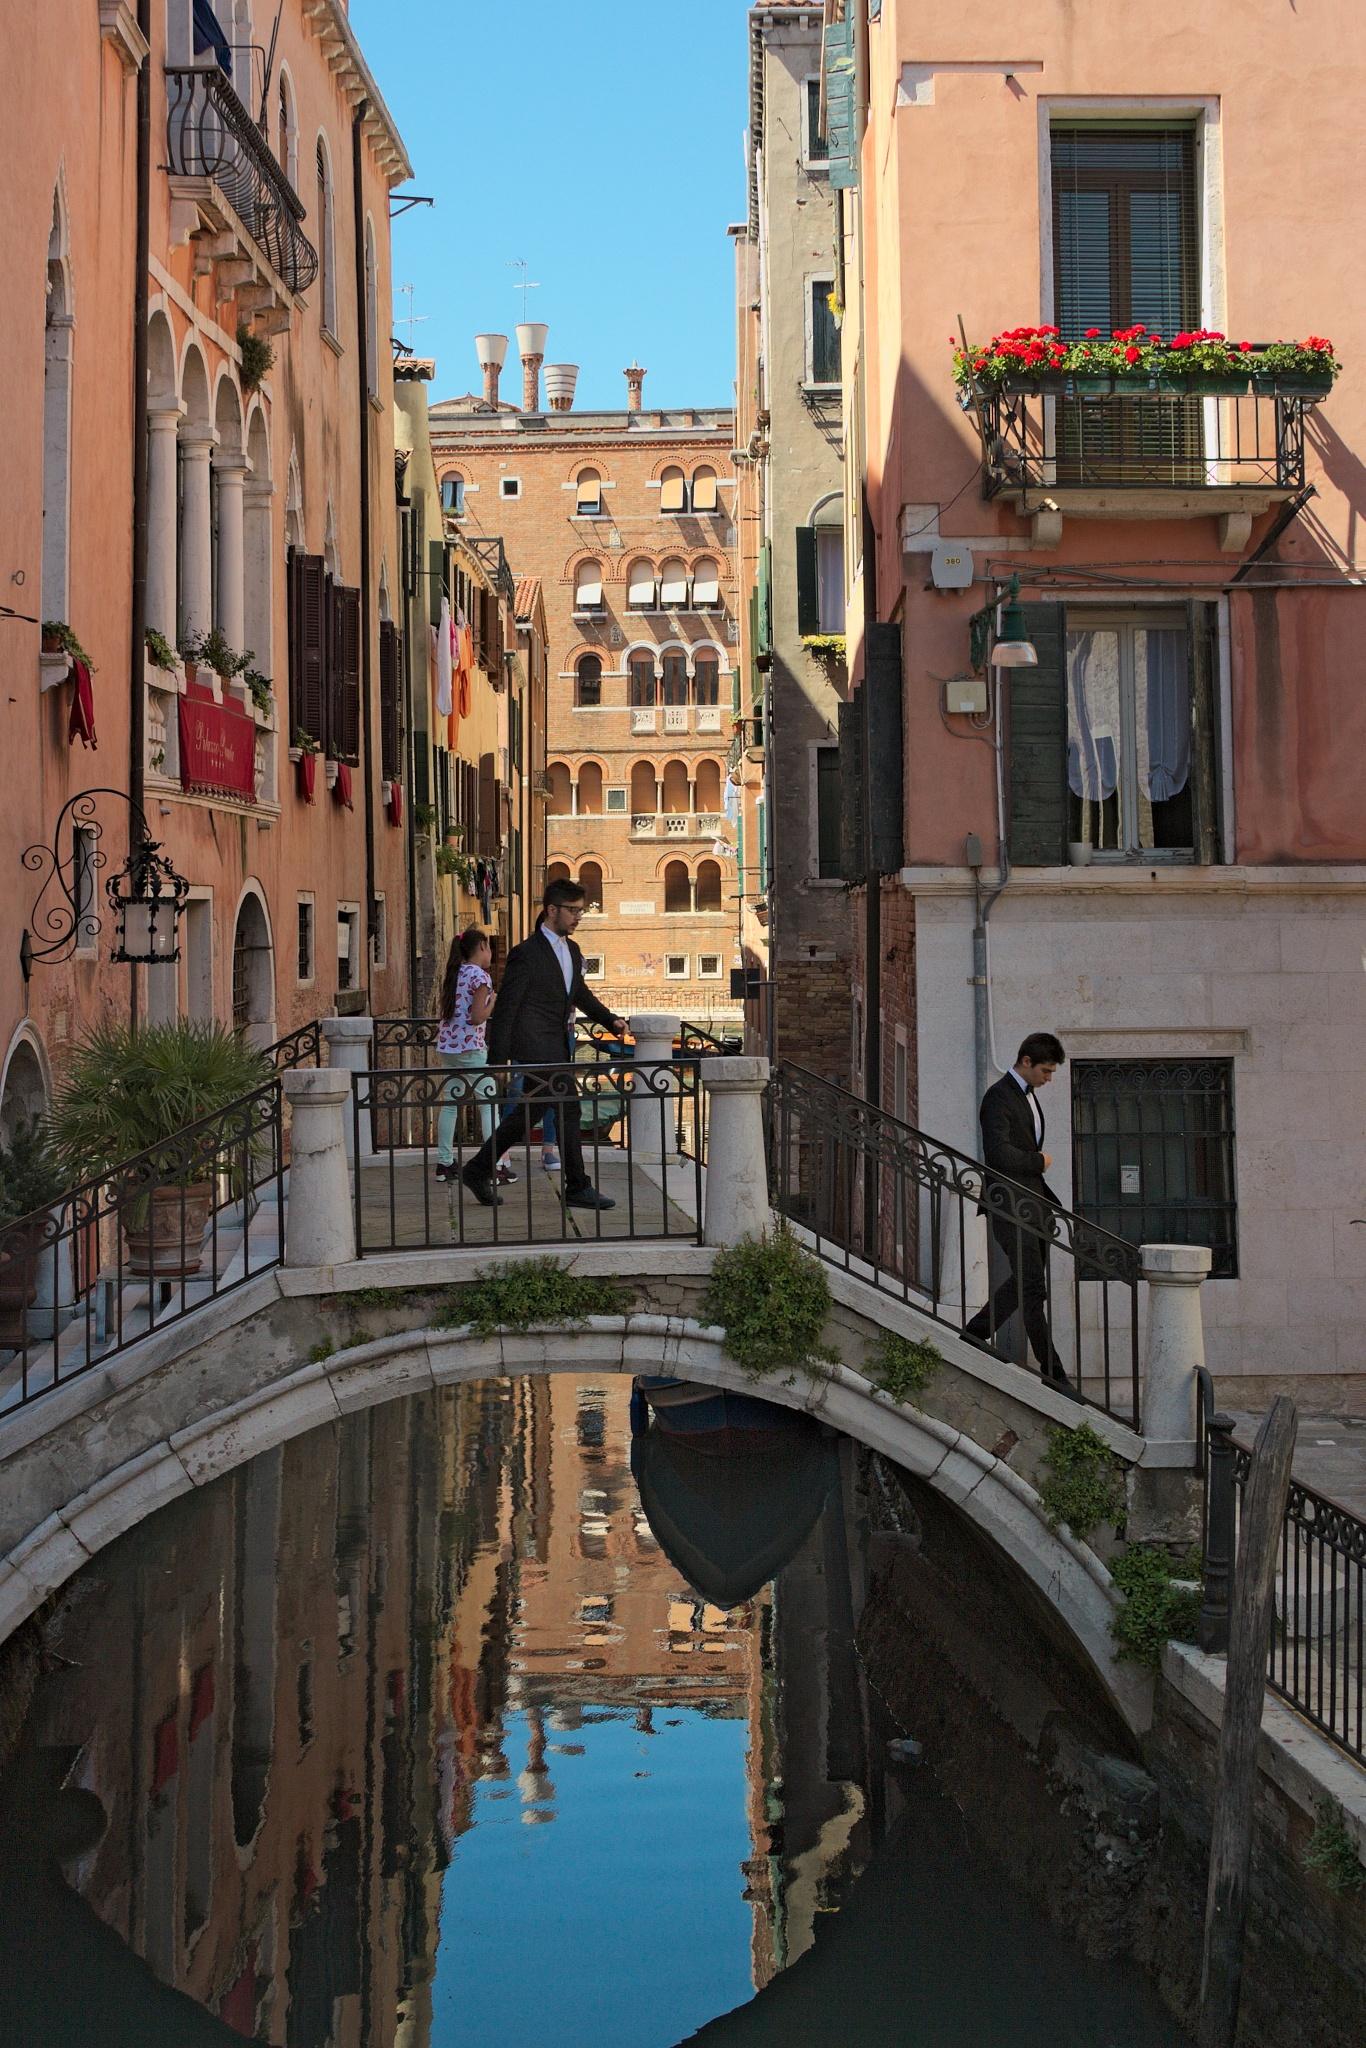 A tiny bridge somewhere in Venice #1 by Alex Zalesny